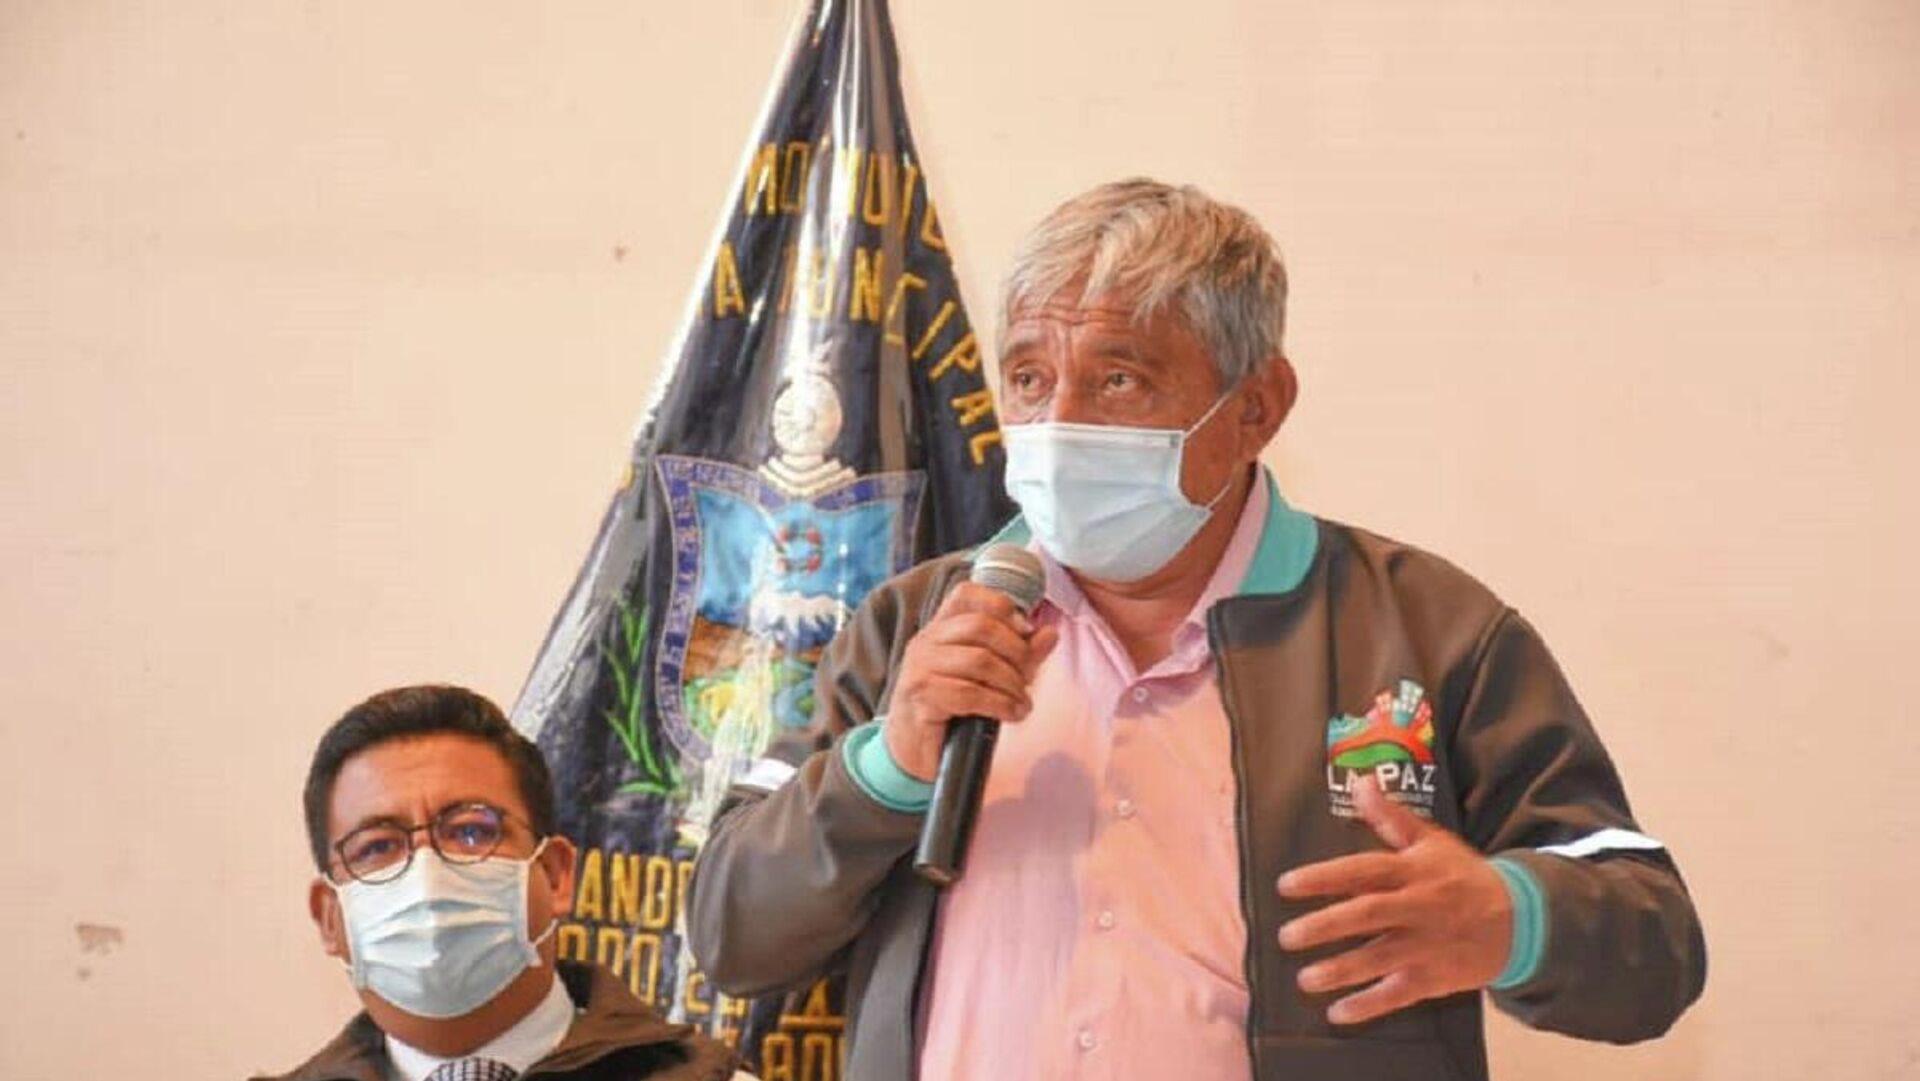 Alcalde de La Paz, Iván Arias - Sputnik Mundo, 1920, 06.09.2021